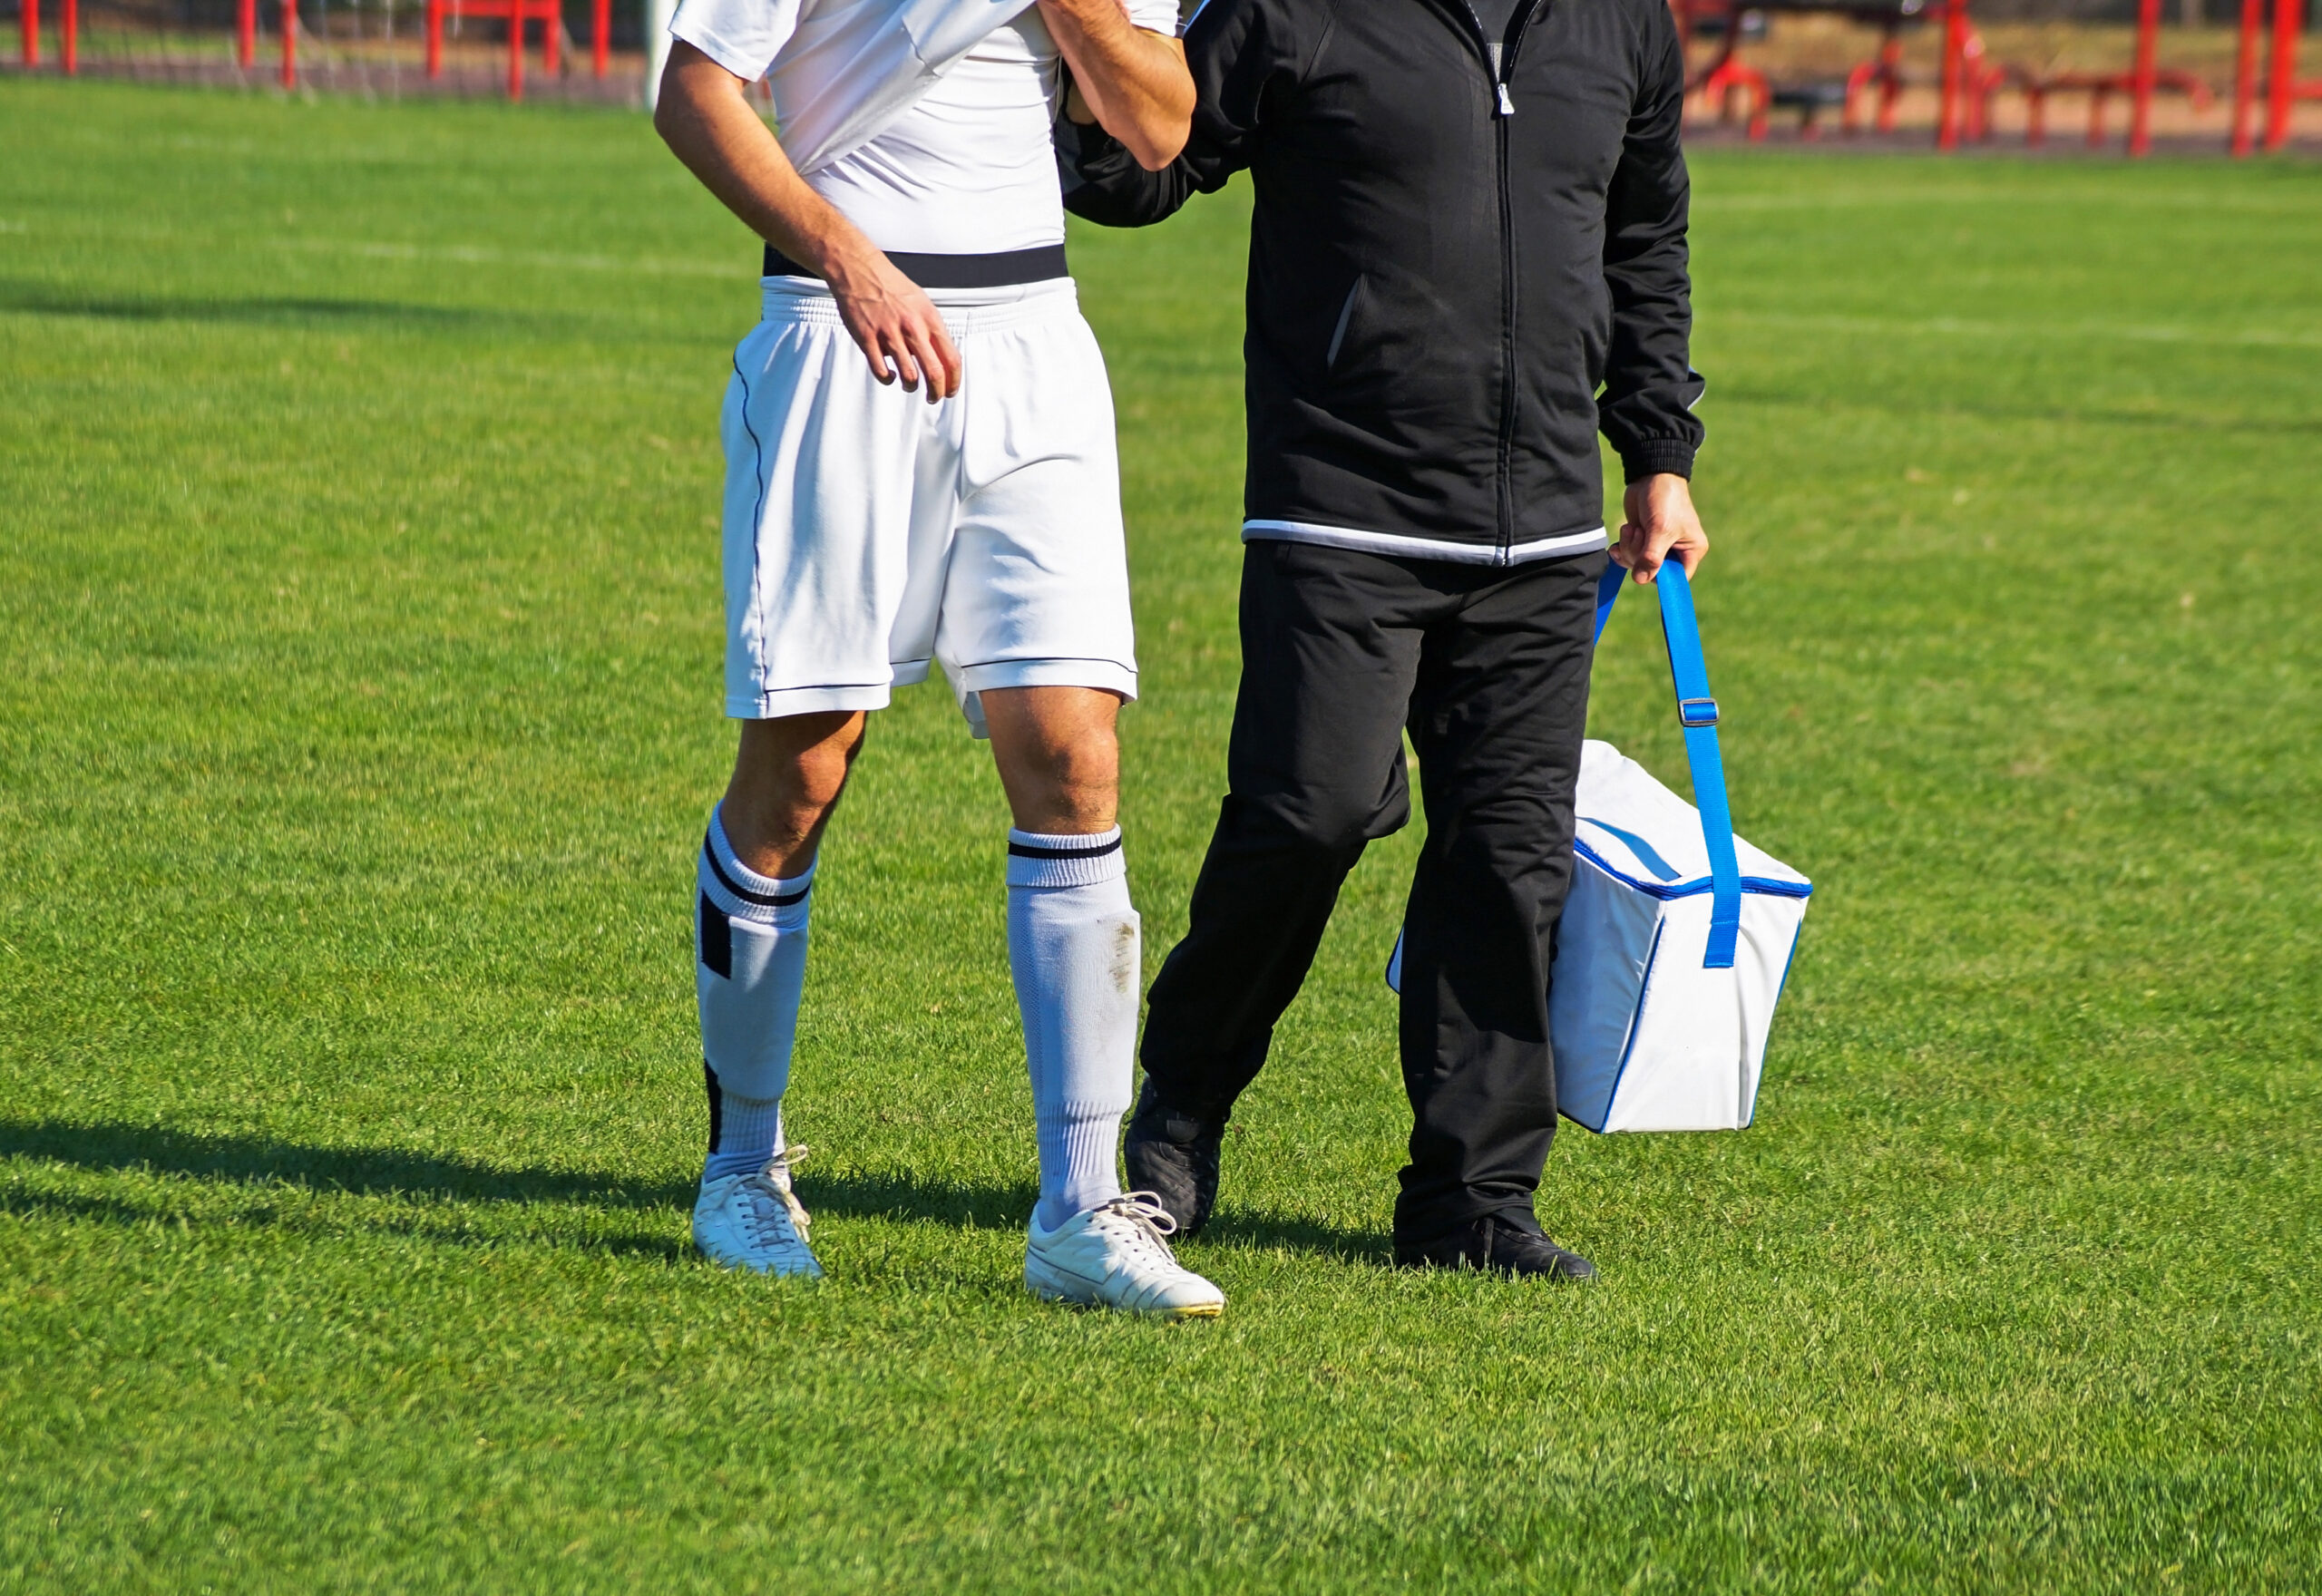 Medic walking with injured soccer player.